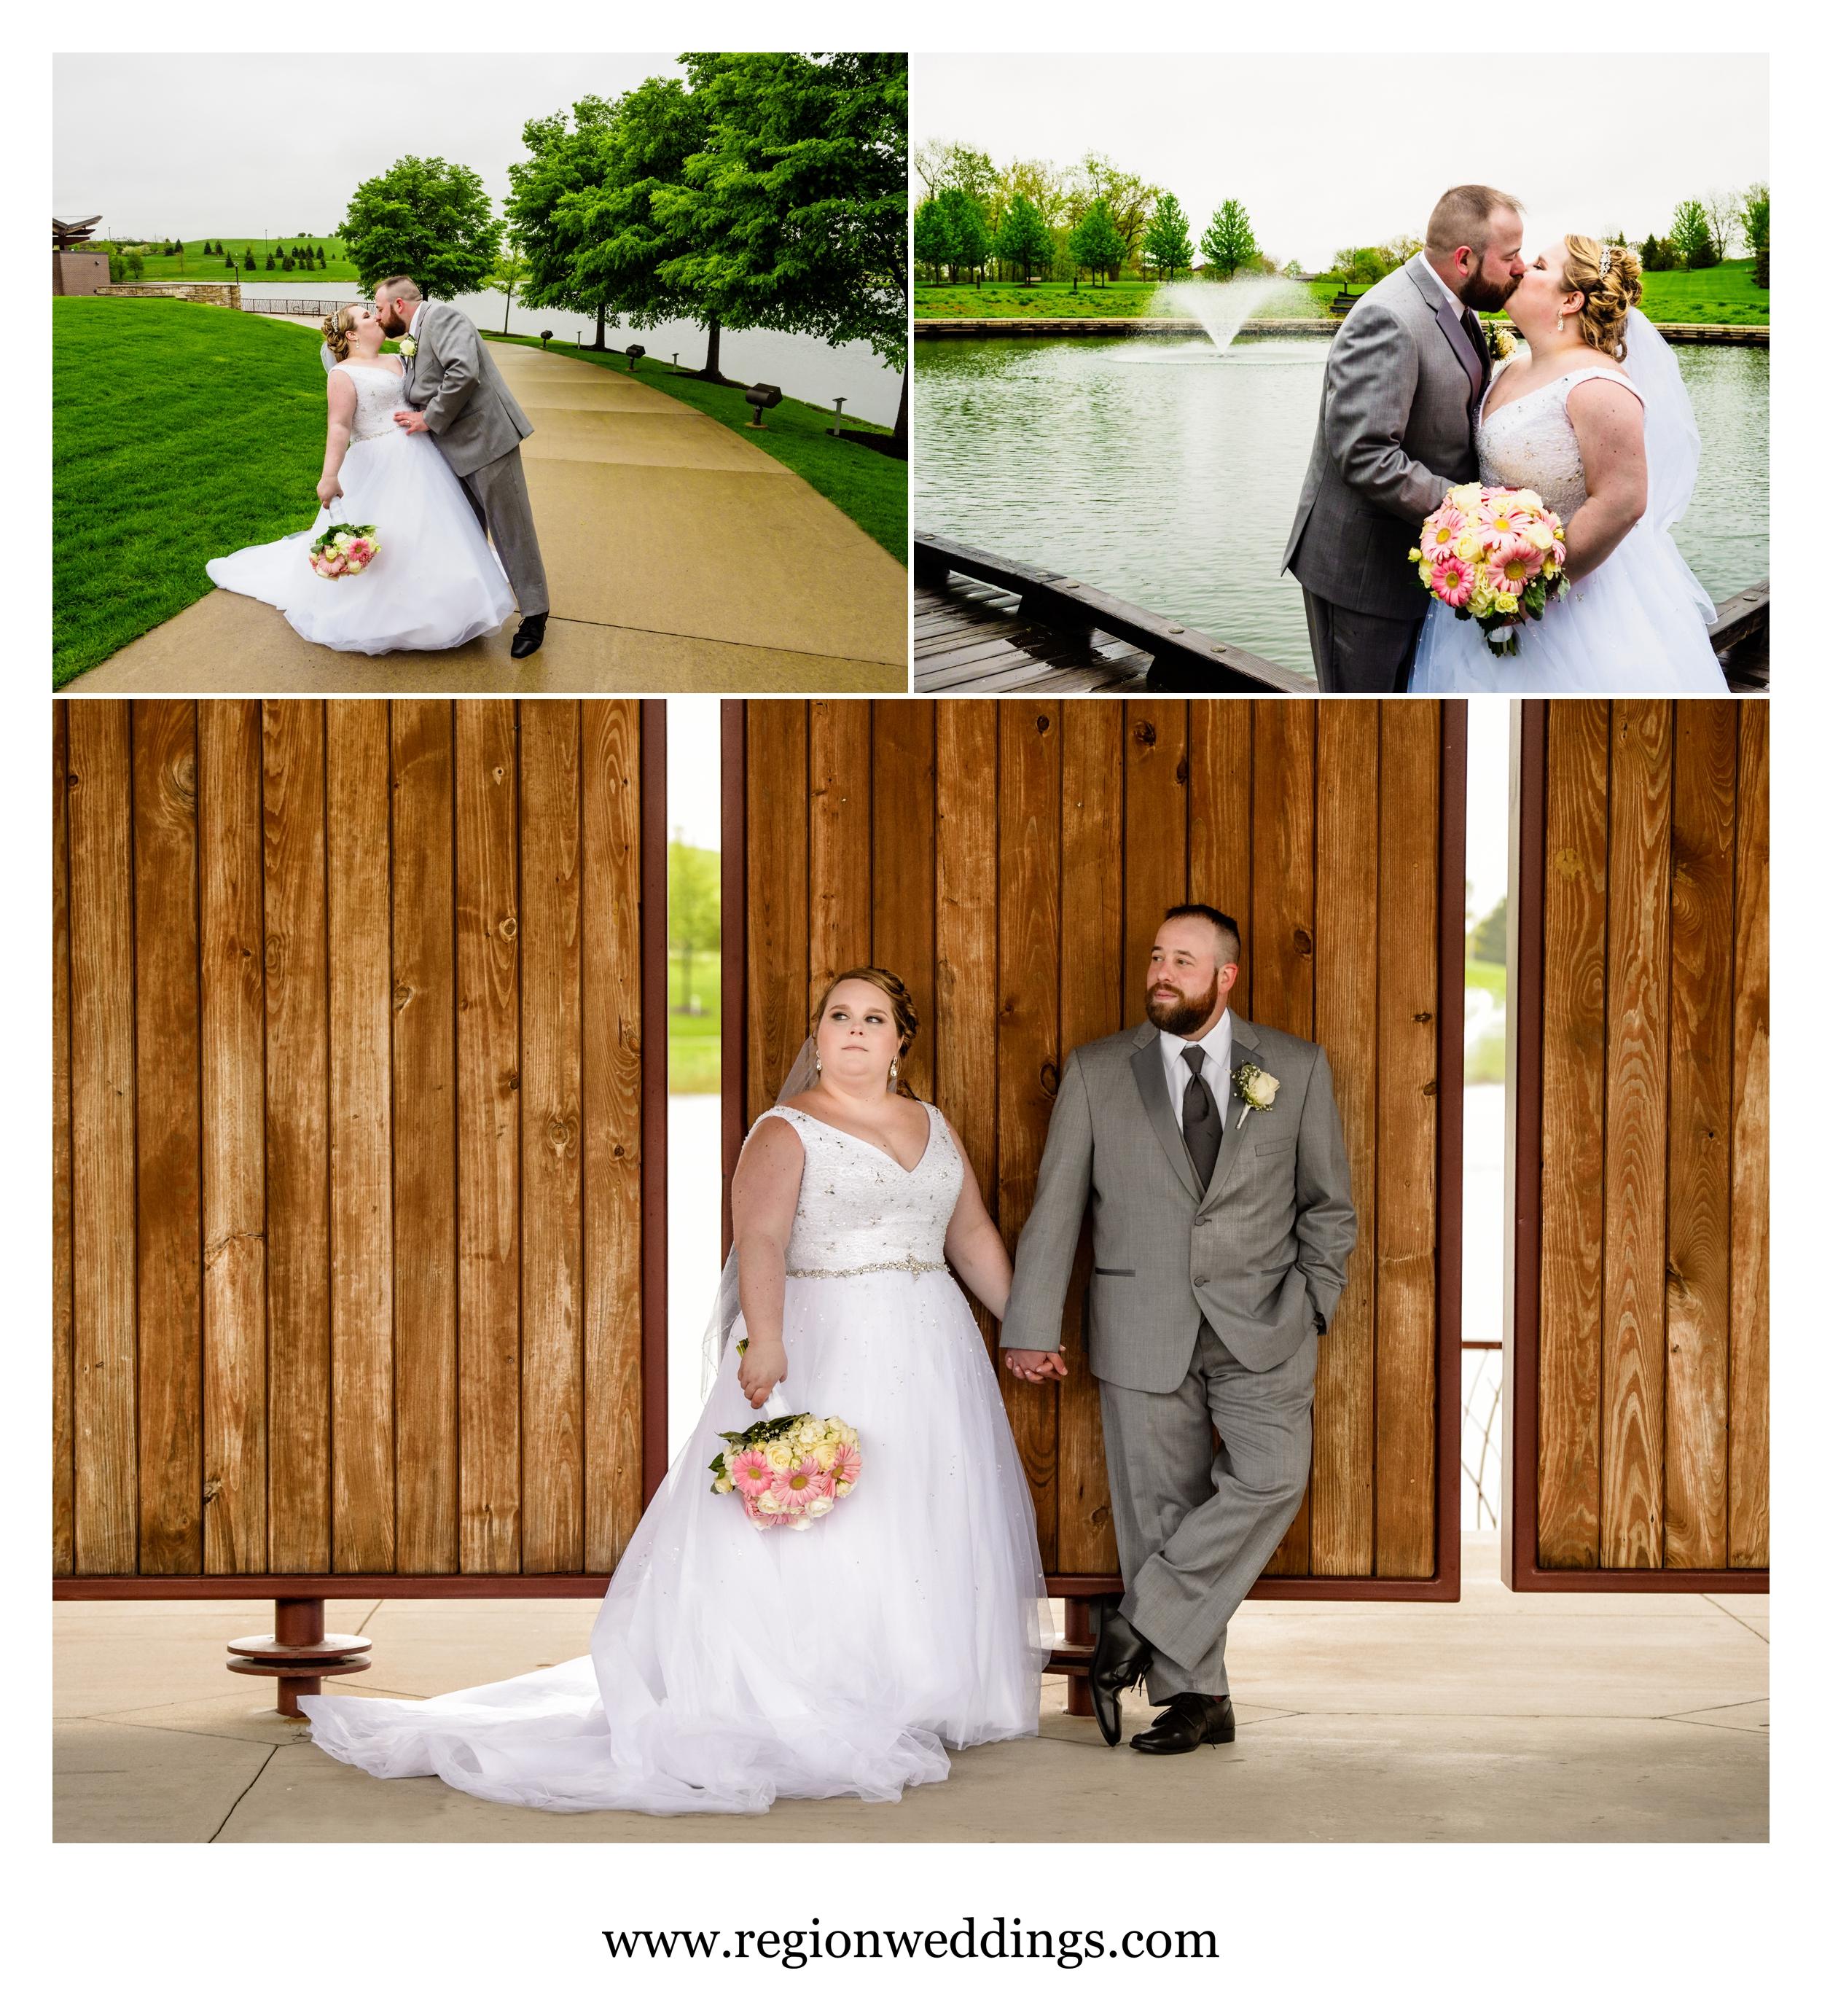 rain-centennial-park-wedding-photos.jpg